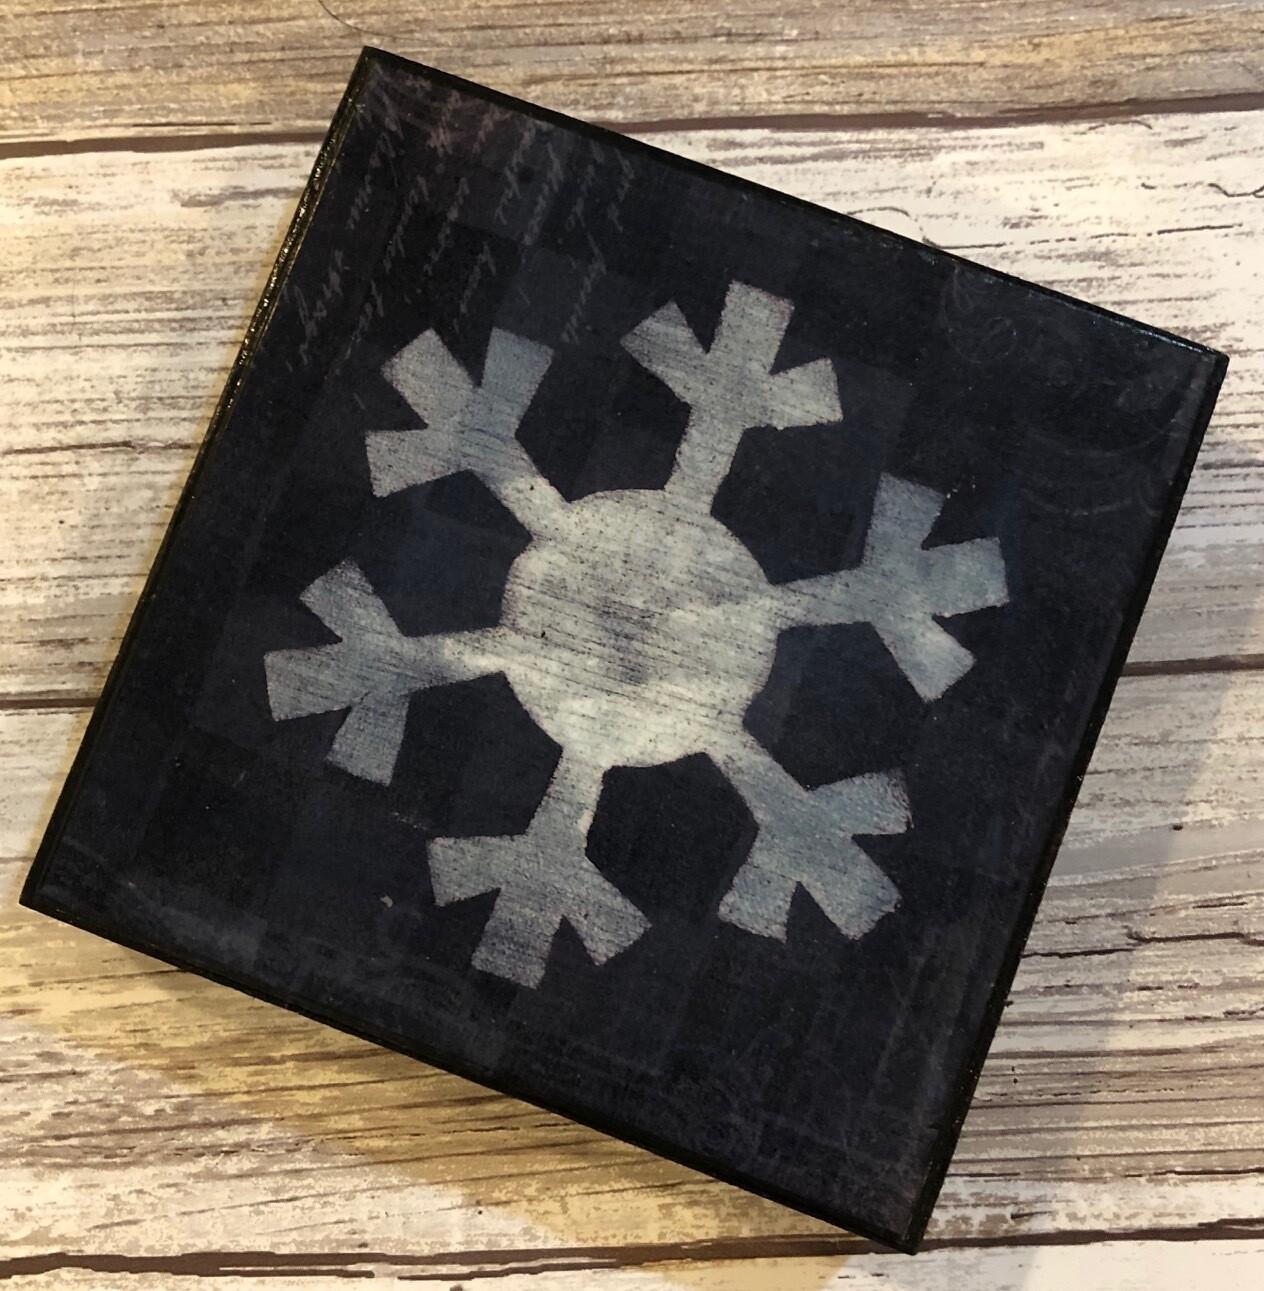 """Snowflake"" writing 4x4 clearance"